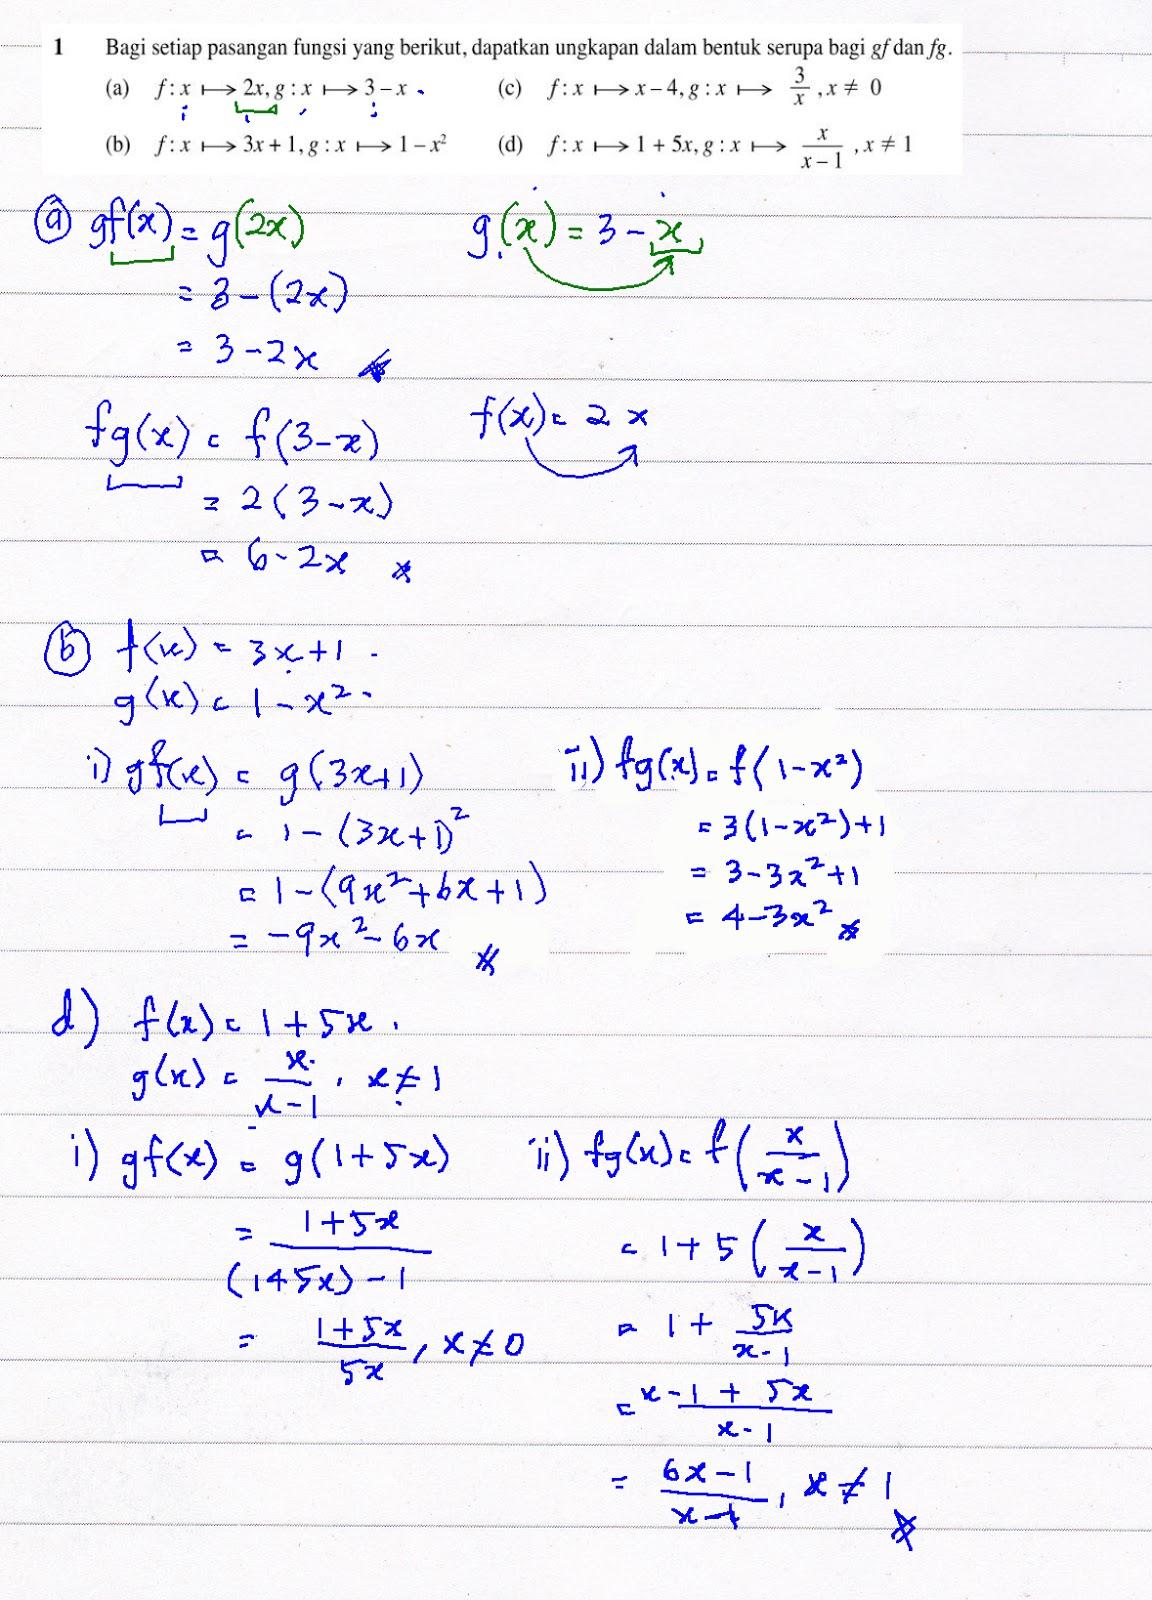 Matematik Tambahan Tingkatan 4 Fungsi Kuadratik Video 3 Youtube Resepkuini